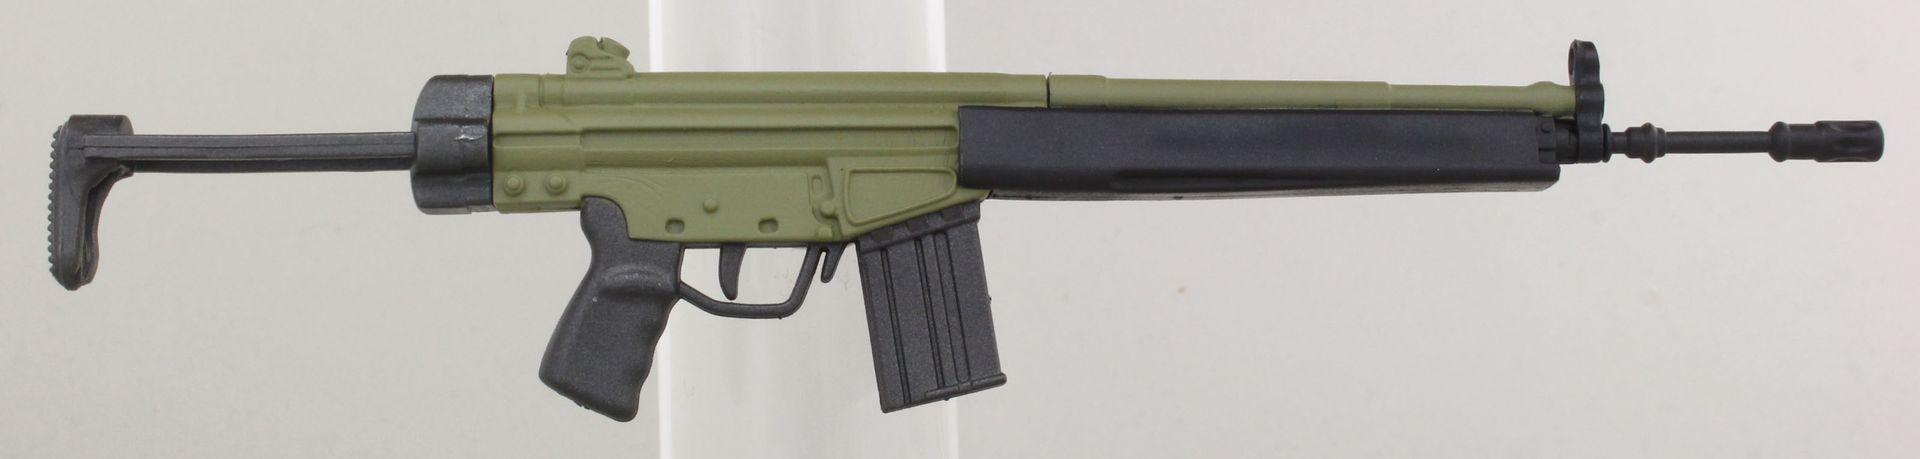 G3A4 伸縮型ストックモデル